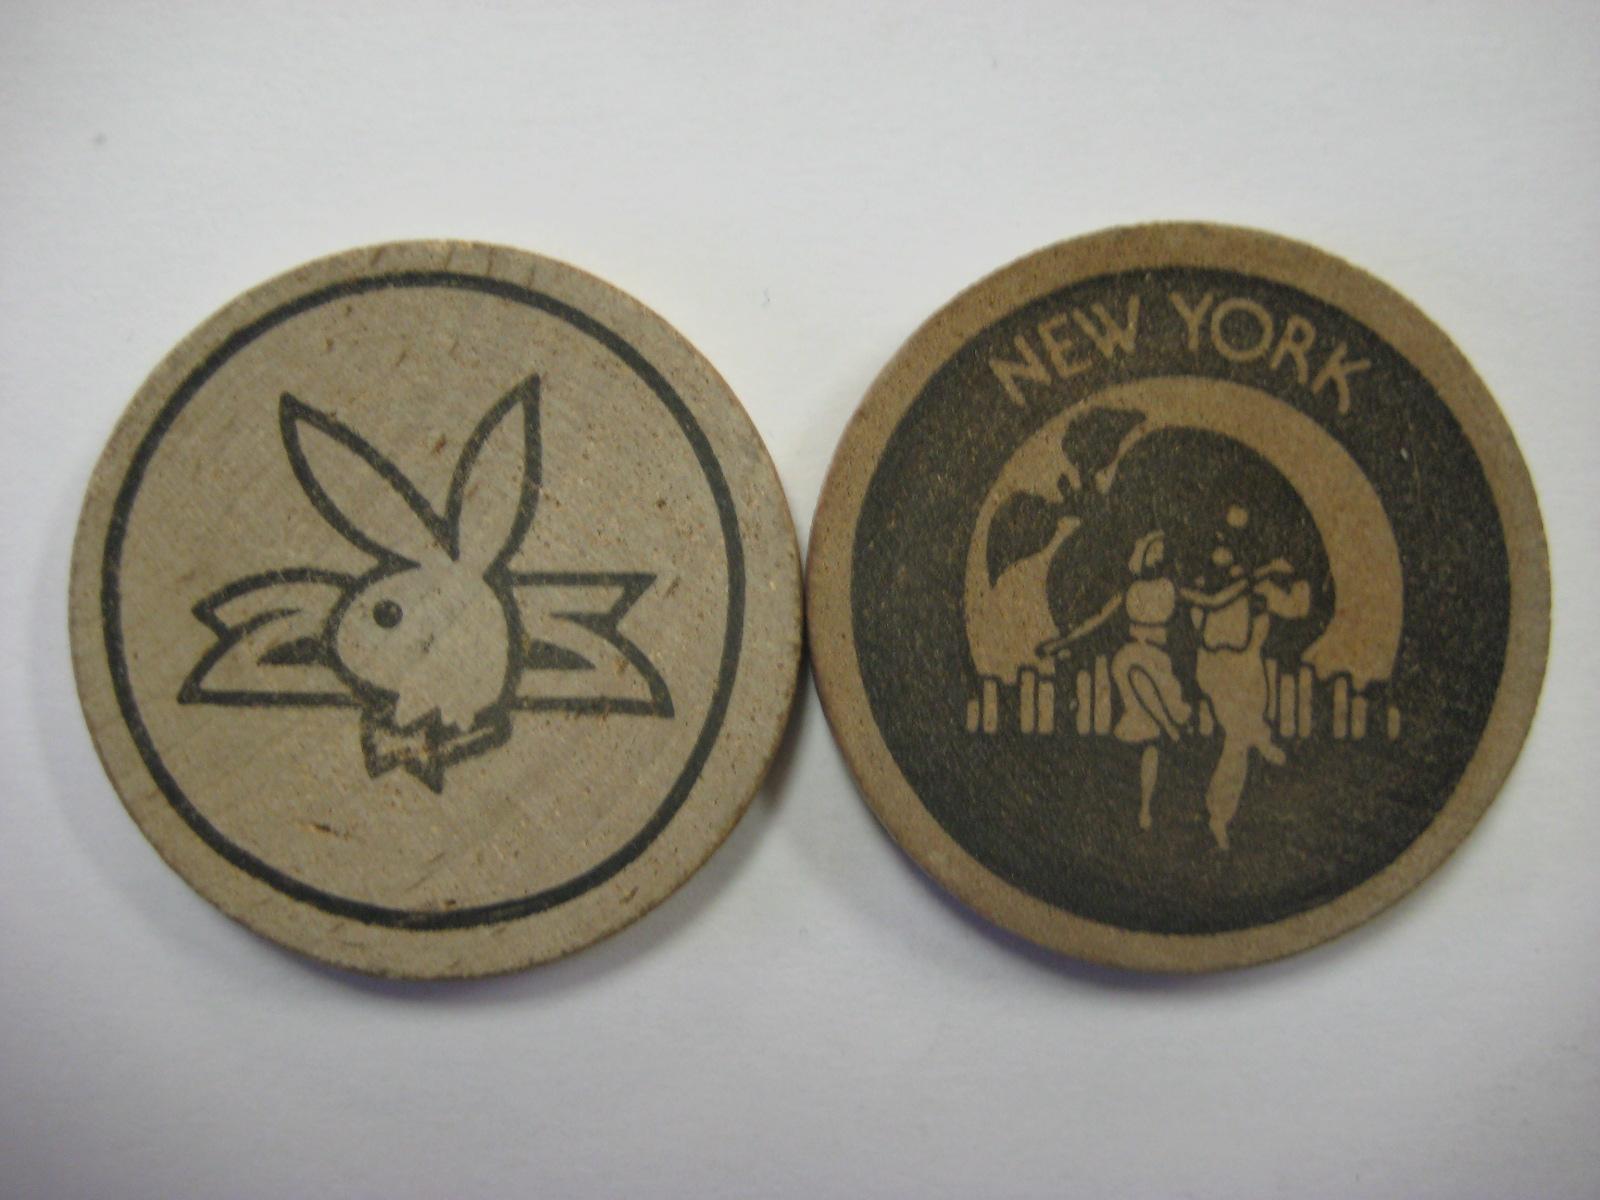 Plaboy Club New York City wooden Nickel